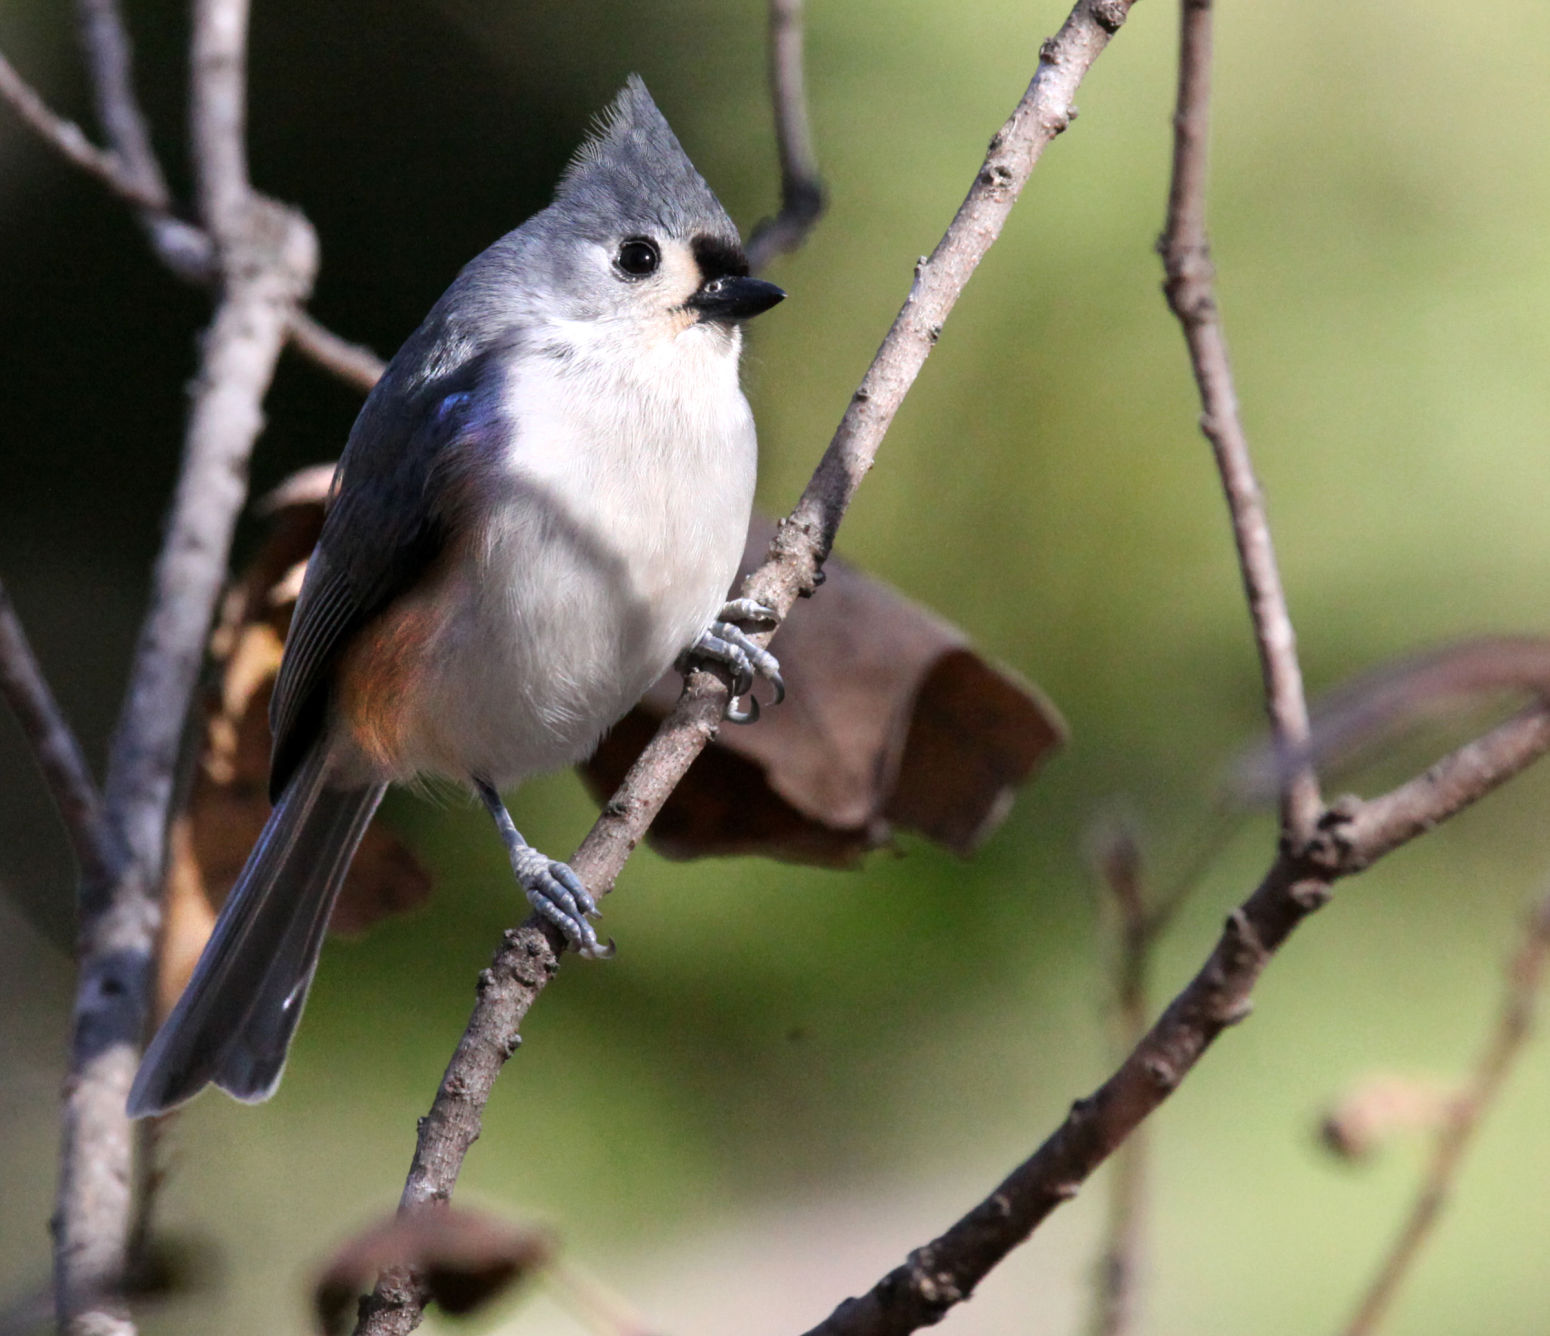 Photo gallery: Backyard birds on a winter's day